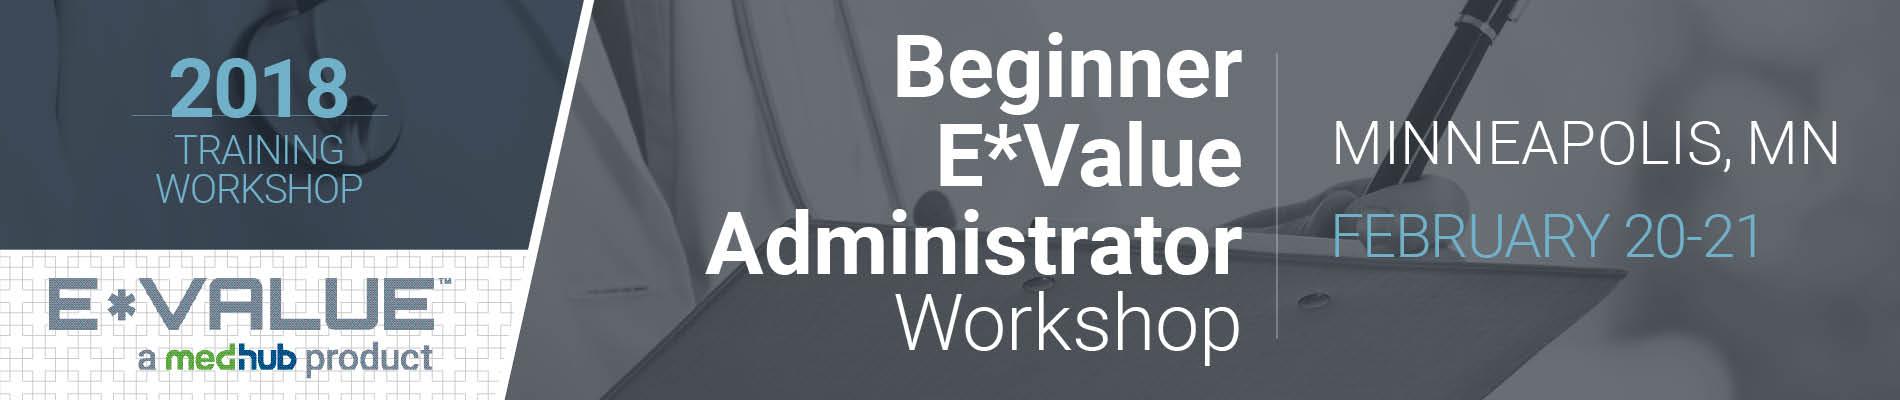 E*Value New Administrator Workshop (February 20-21)